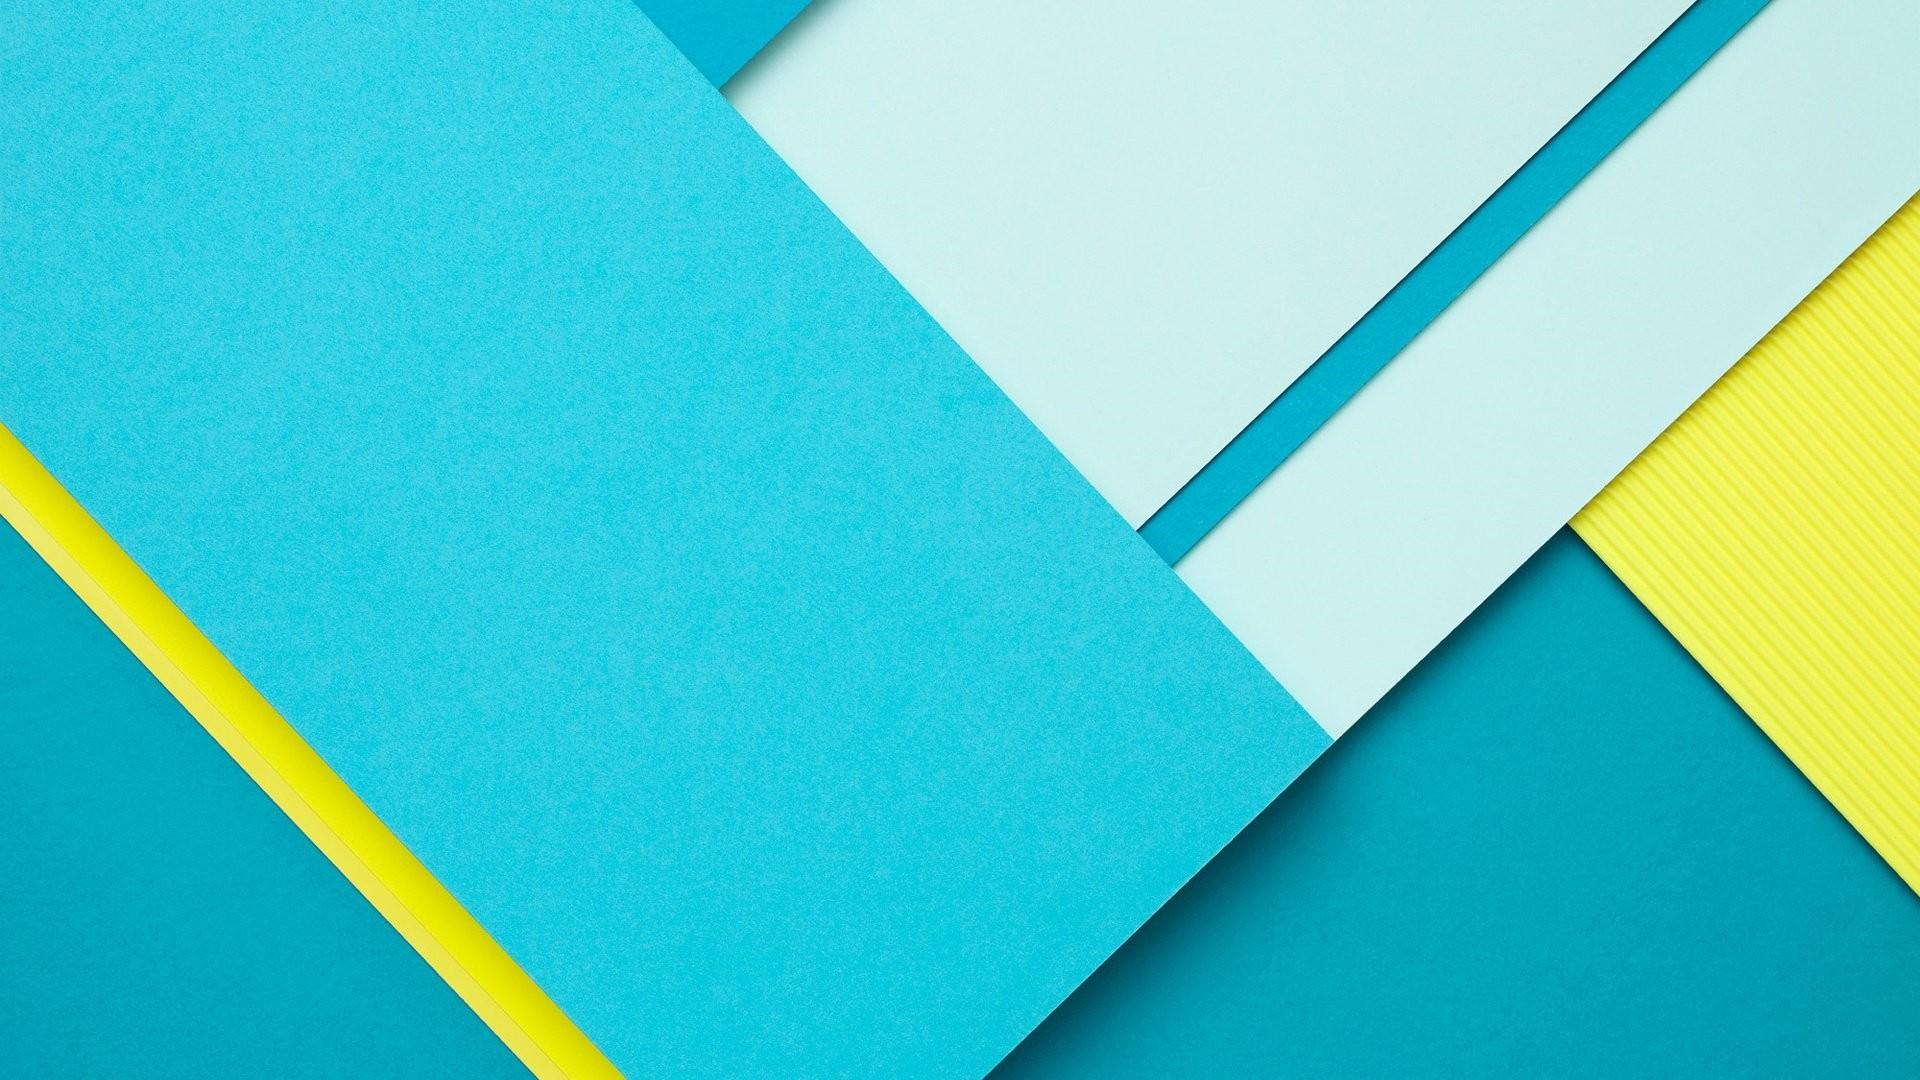 Blue And Yellow Desktop Wallpaper